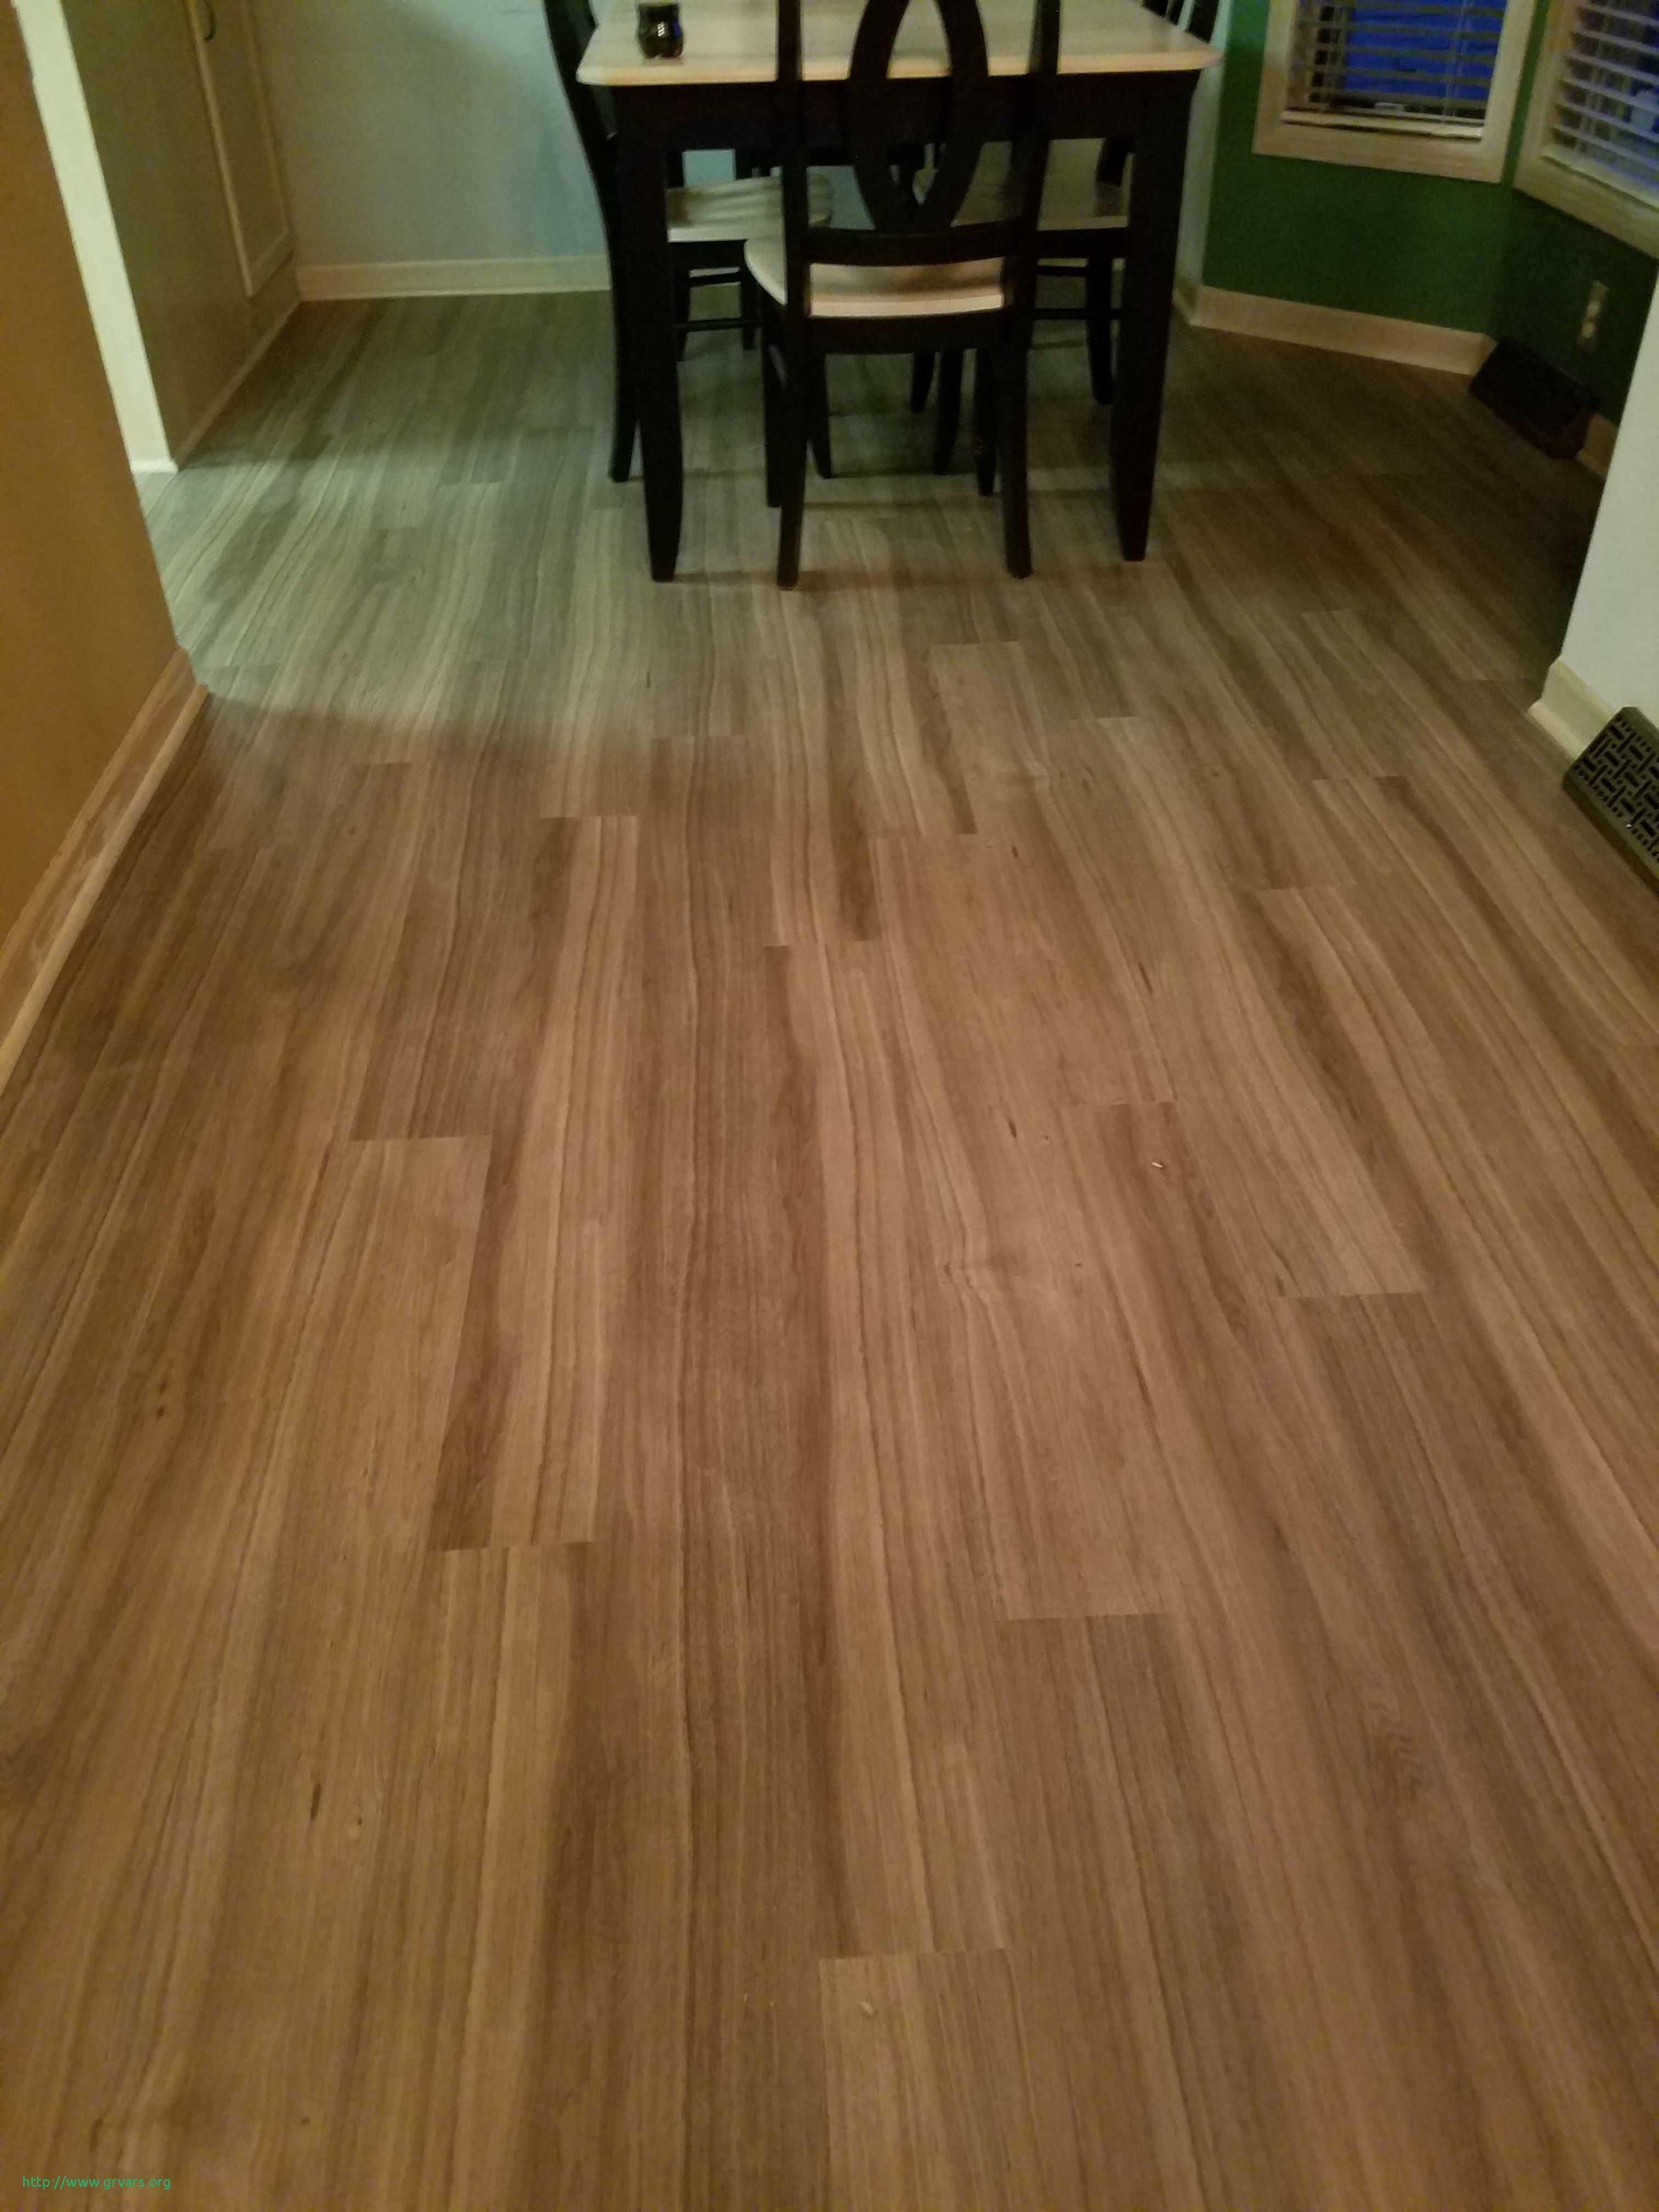 quality hardwood floors inc of 16 nouveau premier floors inc ideas blog pertaining to maple hardwood flooring wel e to floor coverings international waukesha we are the premier flooring pany